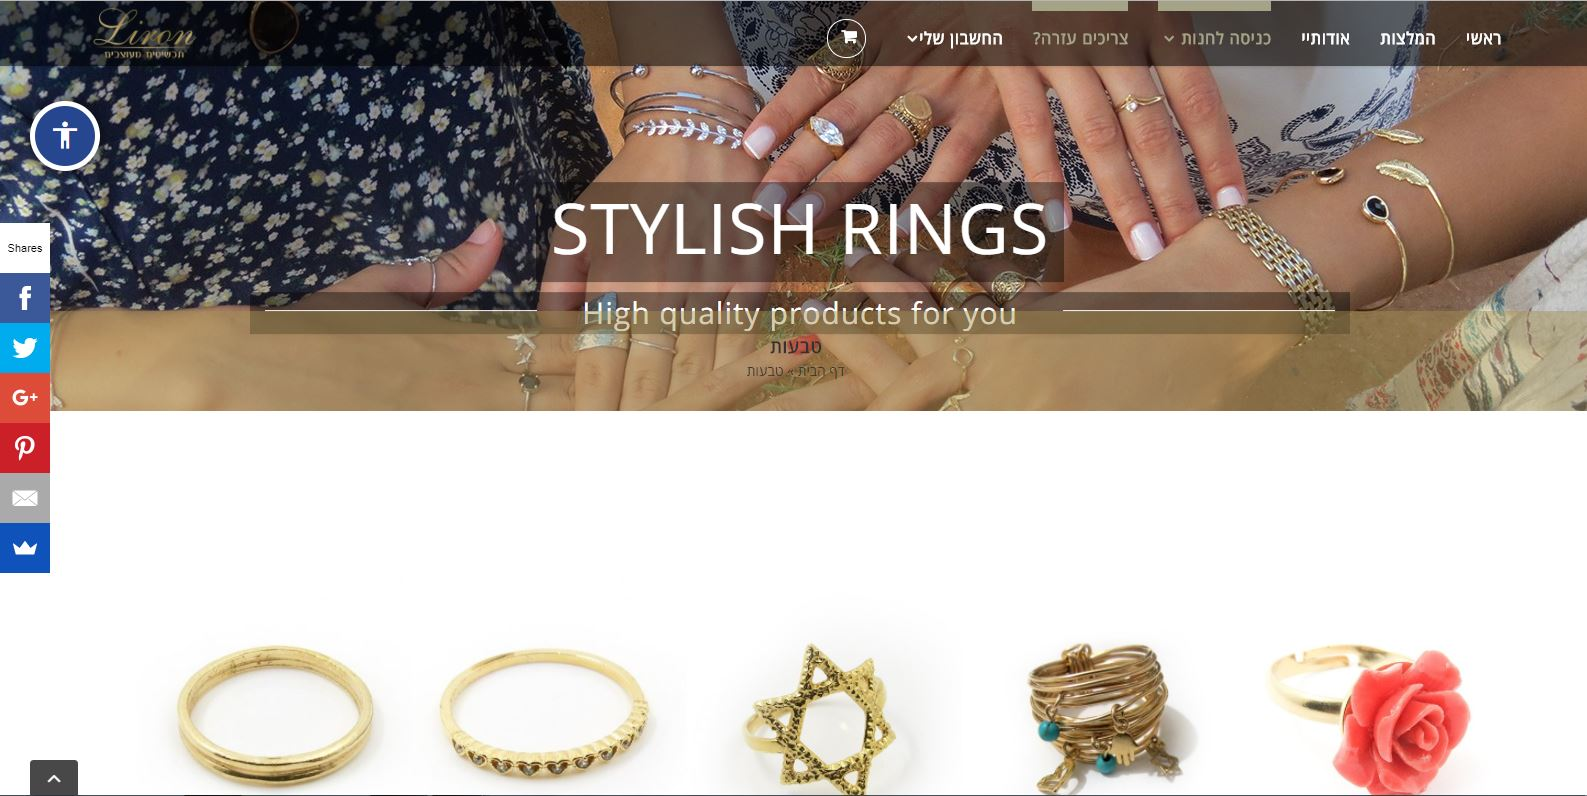 liron-rings